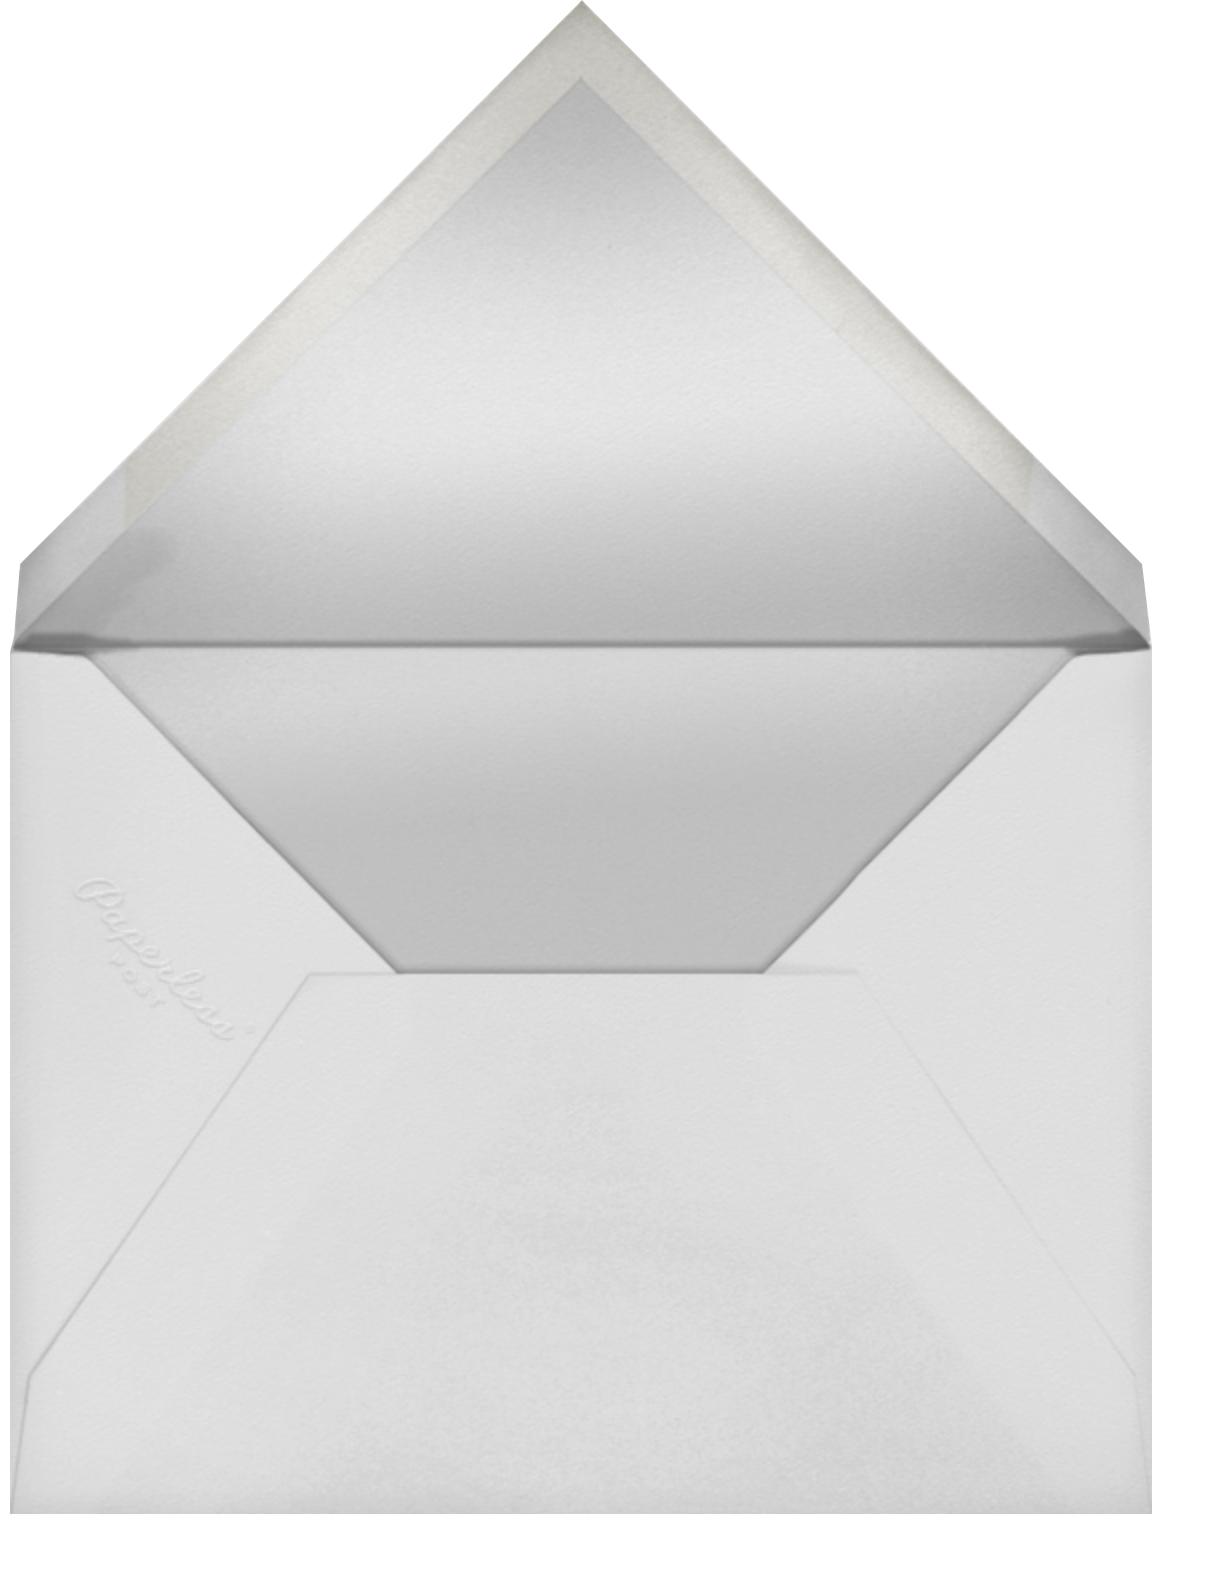 City Lights II (Program) - kate spade new york - Menus and programs - envelope back